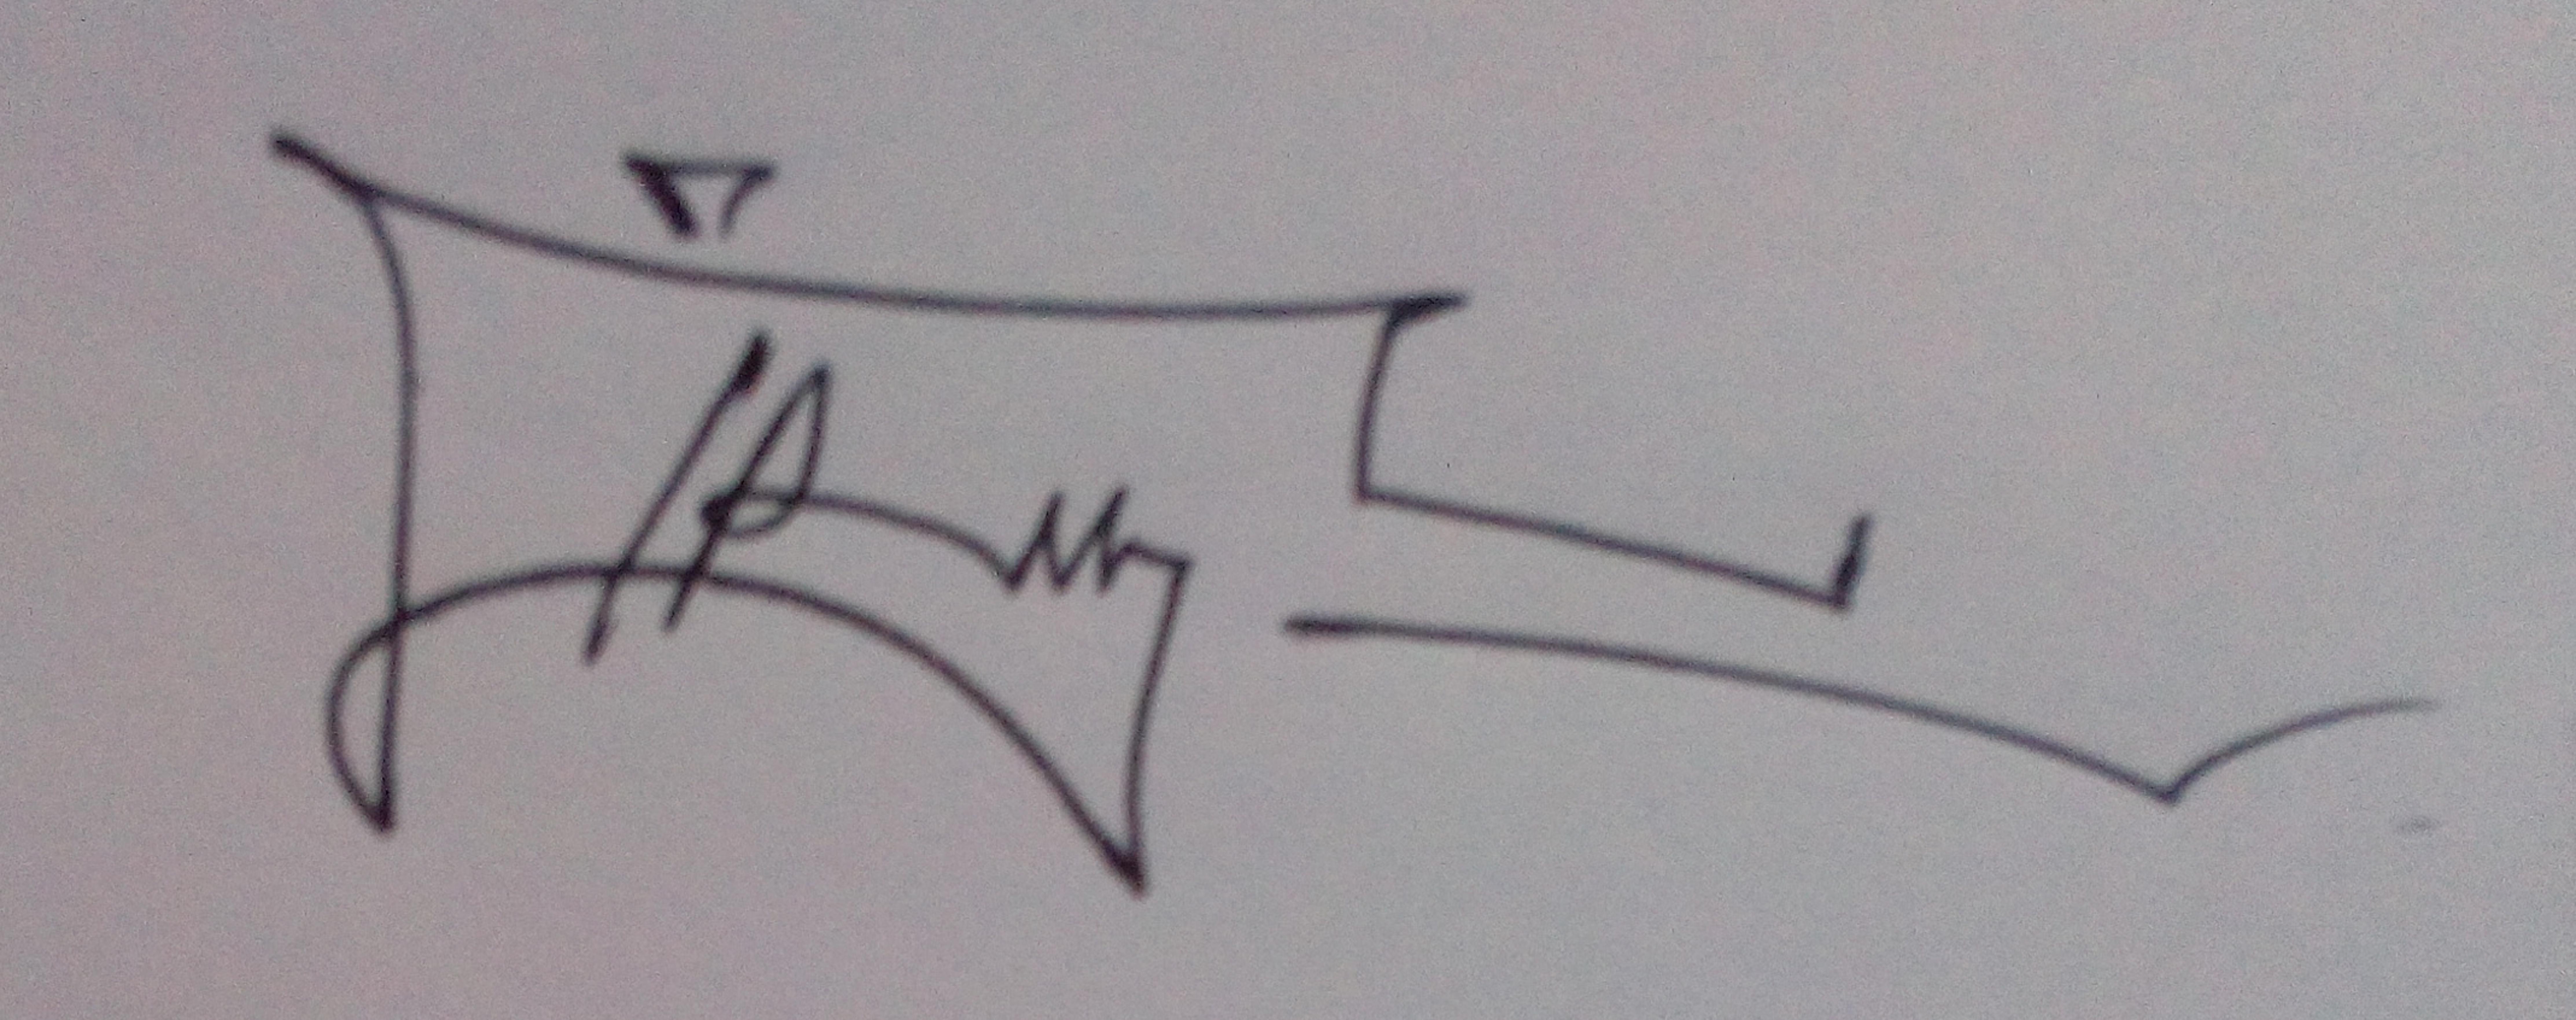 IRUL hidayat's Signature